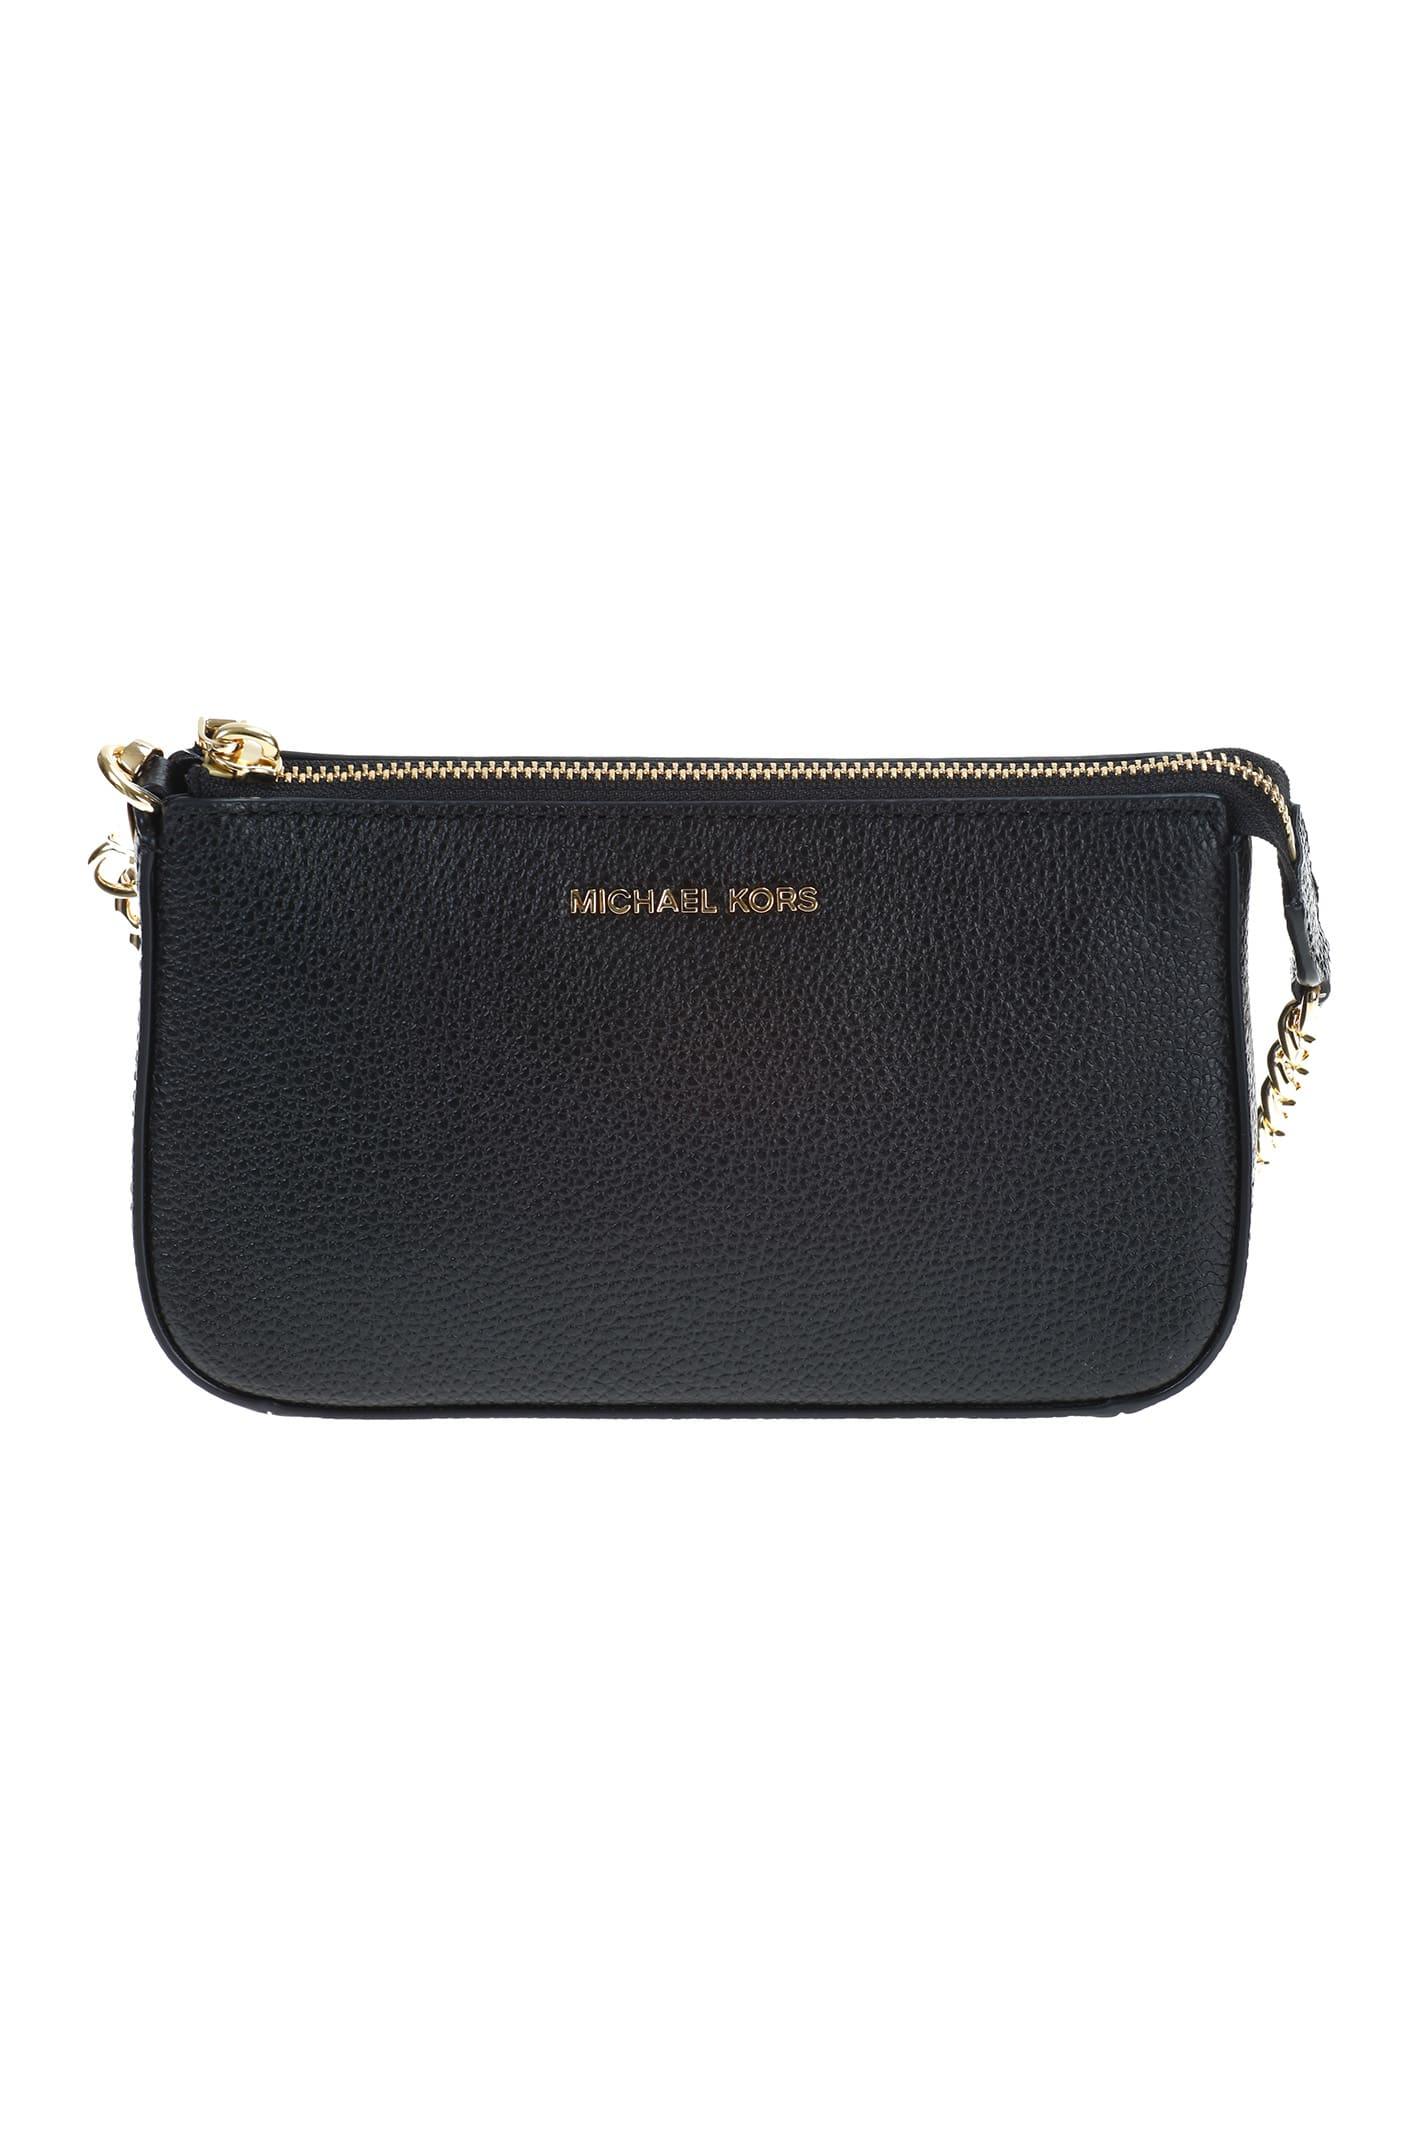 02a6ab1fa53 Michael Michael Kors mini bag